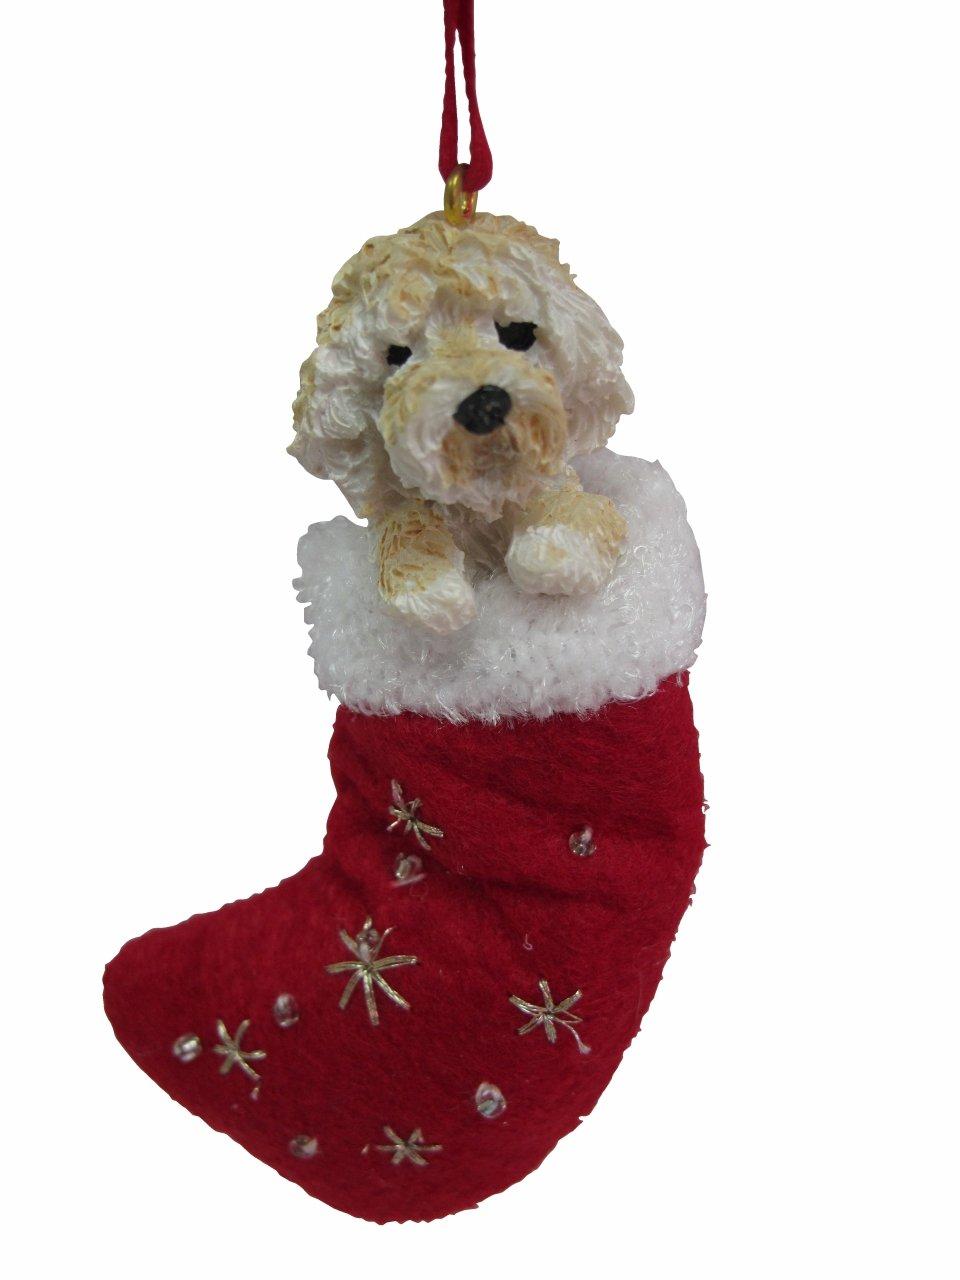 Amazoncom Goldendoodle Christmas Stocking Ornament with Santas